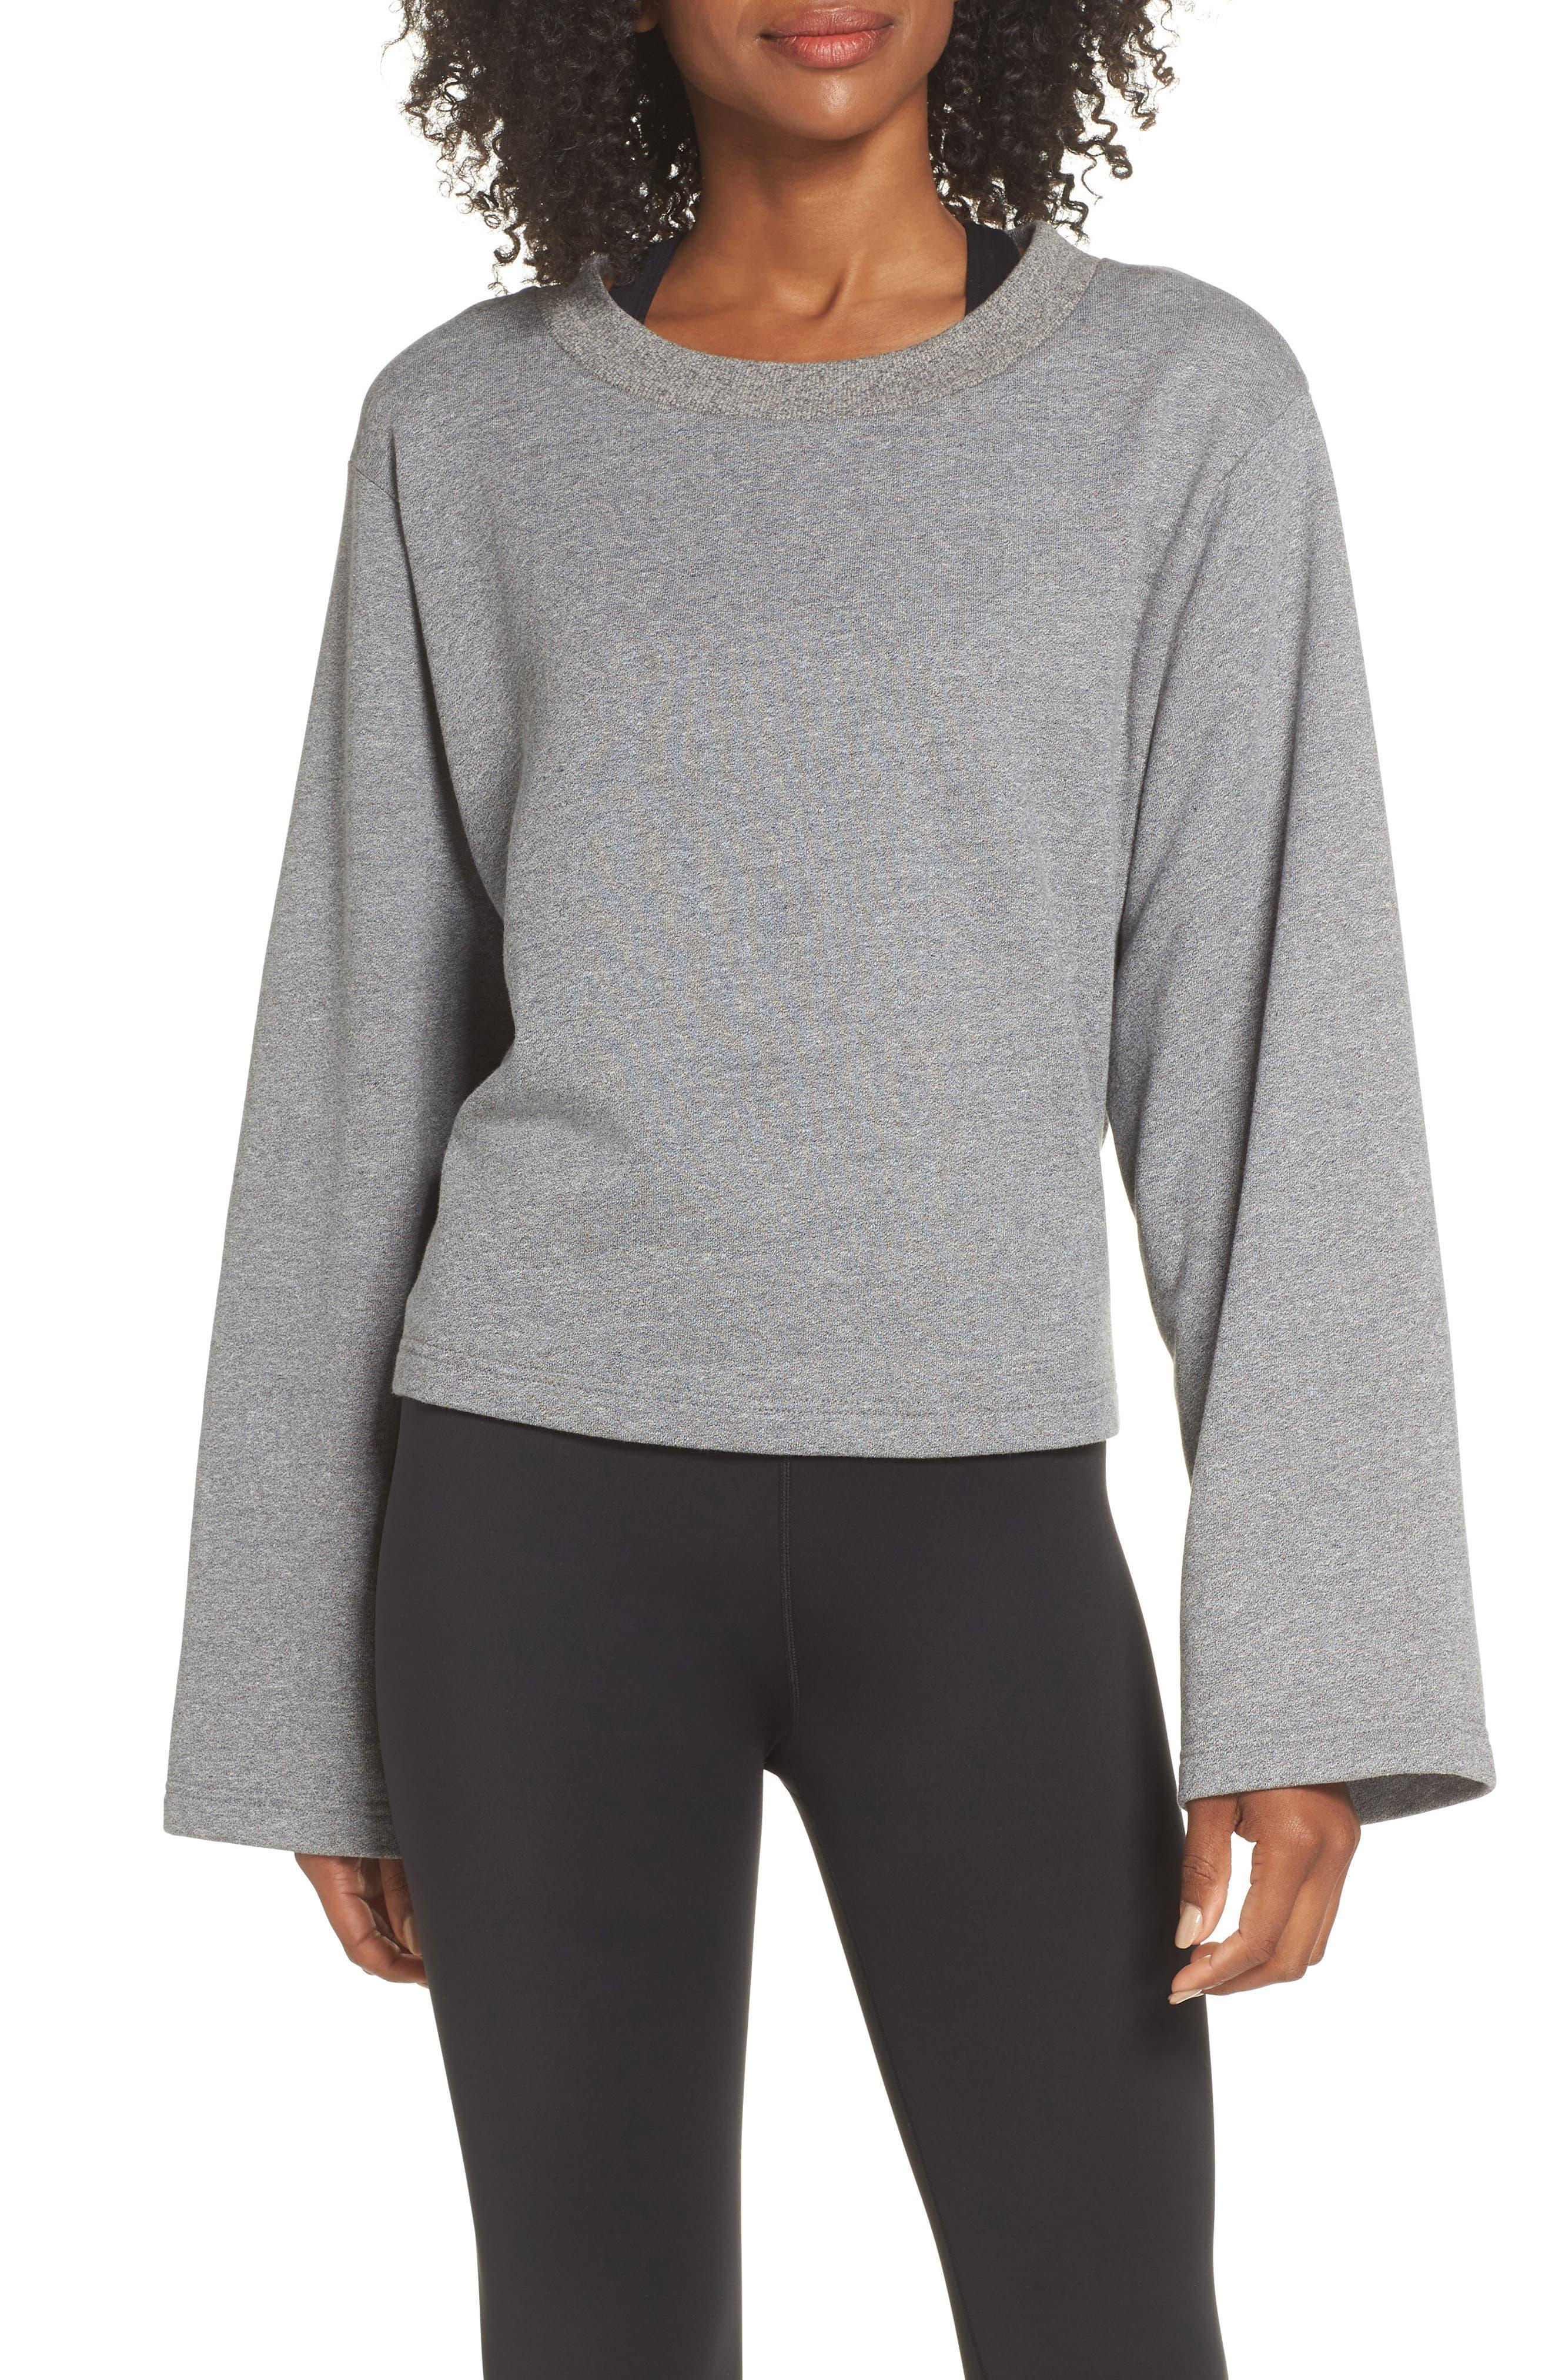 Weymouth Sweatshirt,                             Main thumbnail 1, color,                             DARK GREY